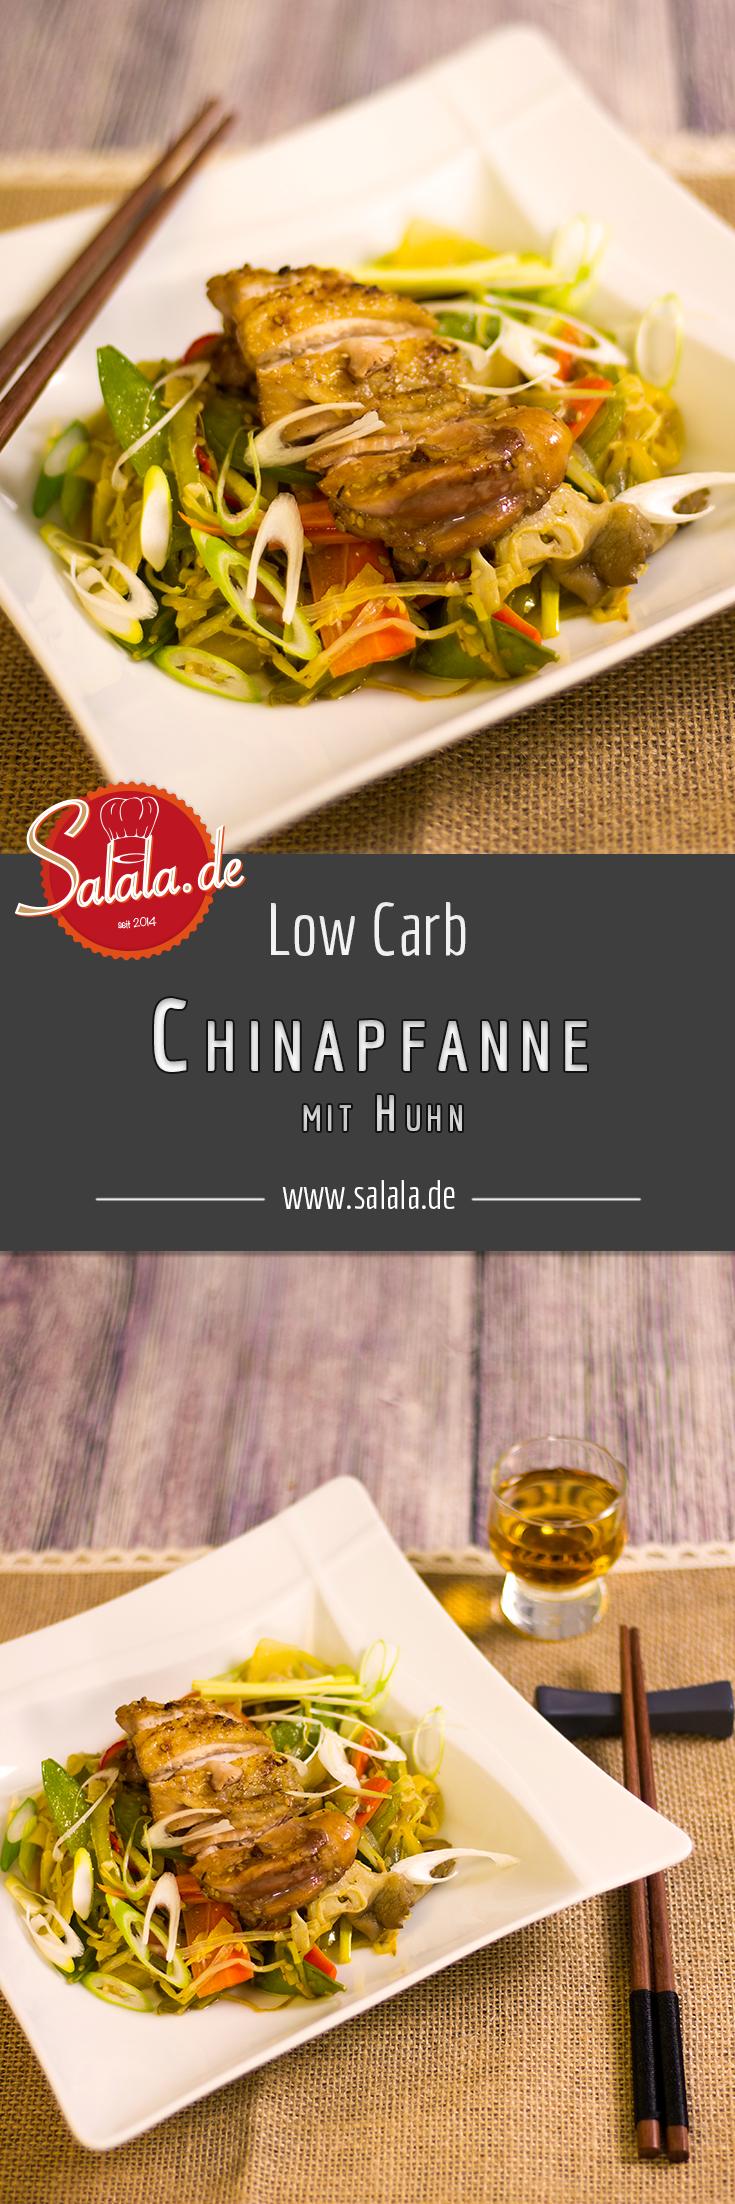 chinapfanne mit huhn low carb rezept low carb pinterest. Black Bedroom Furniture Sets. Home Design Ideas